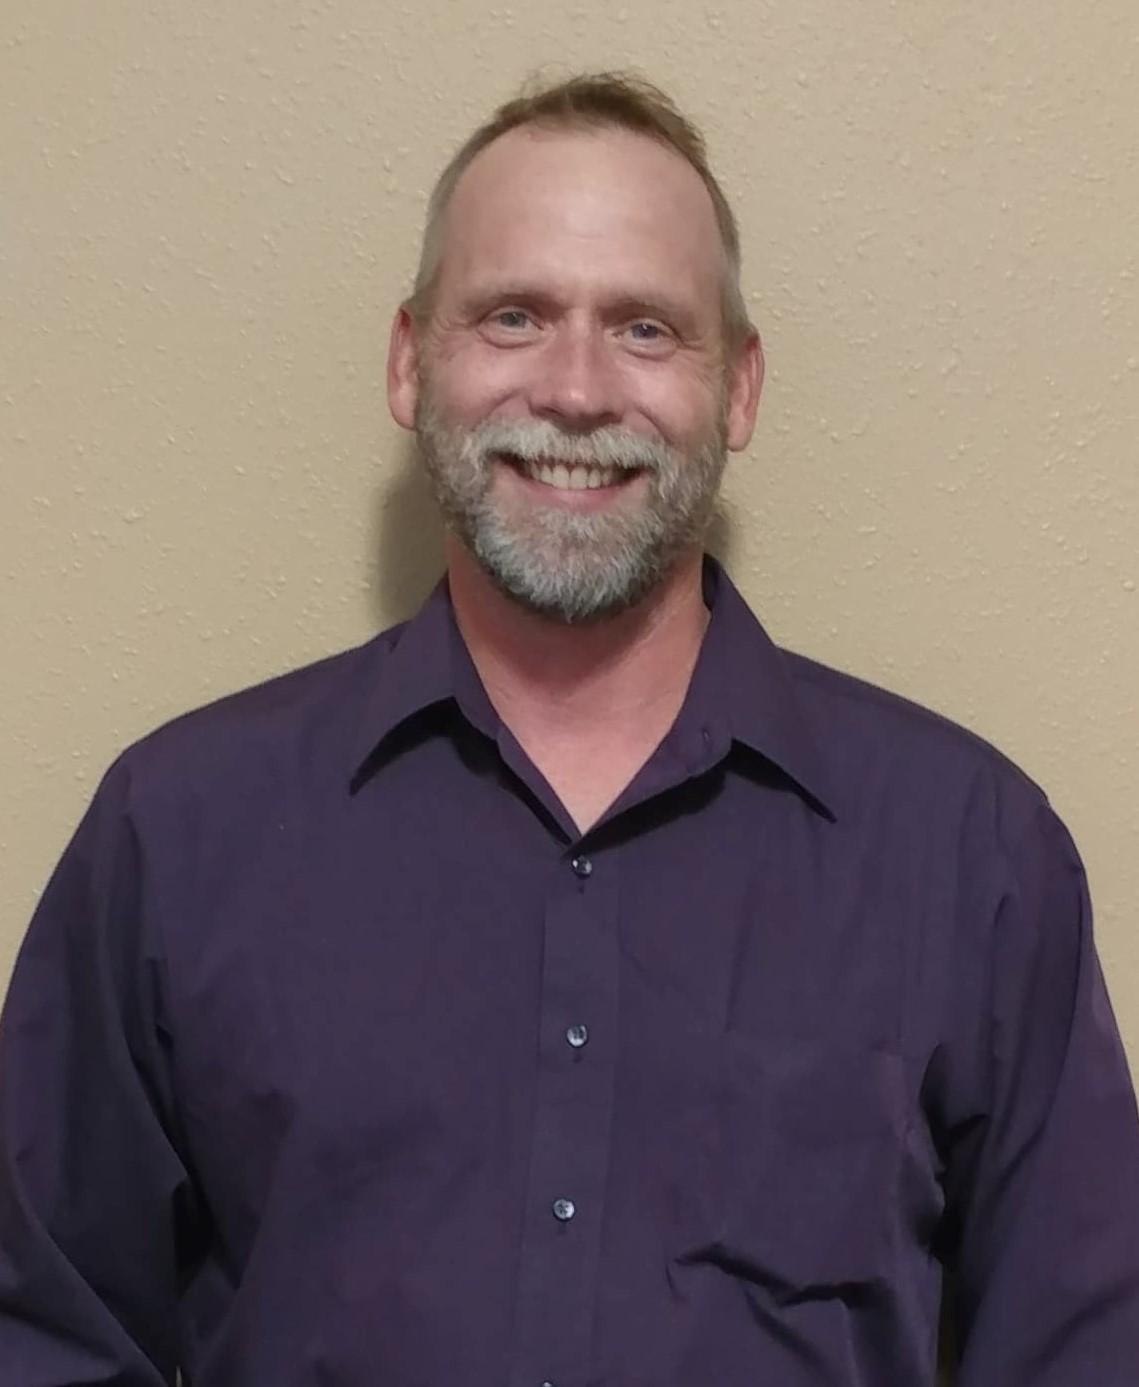 Brad Erickson